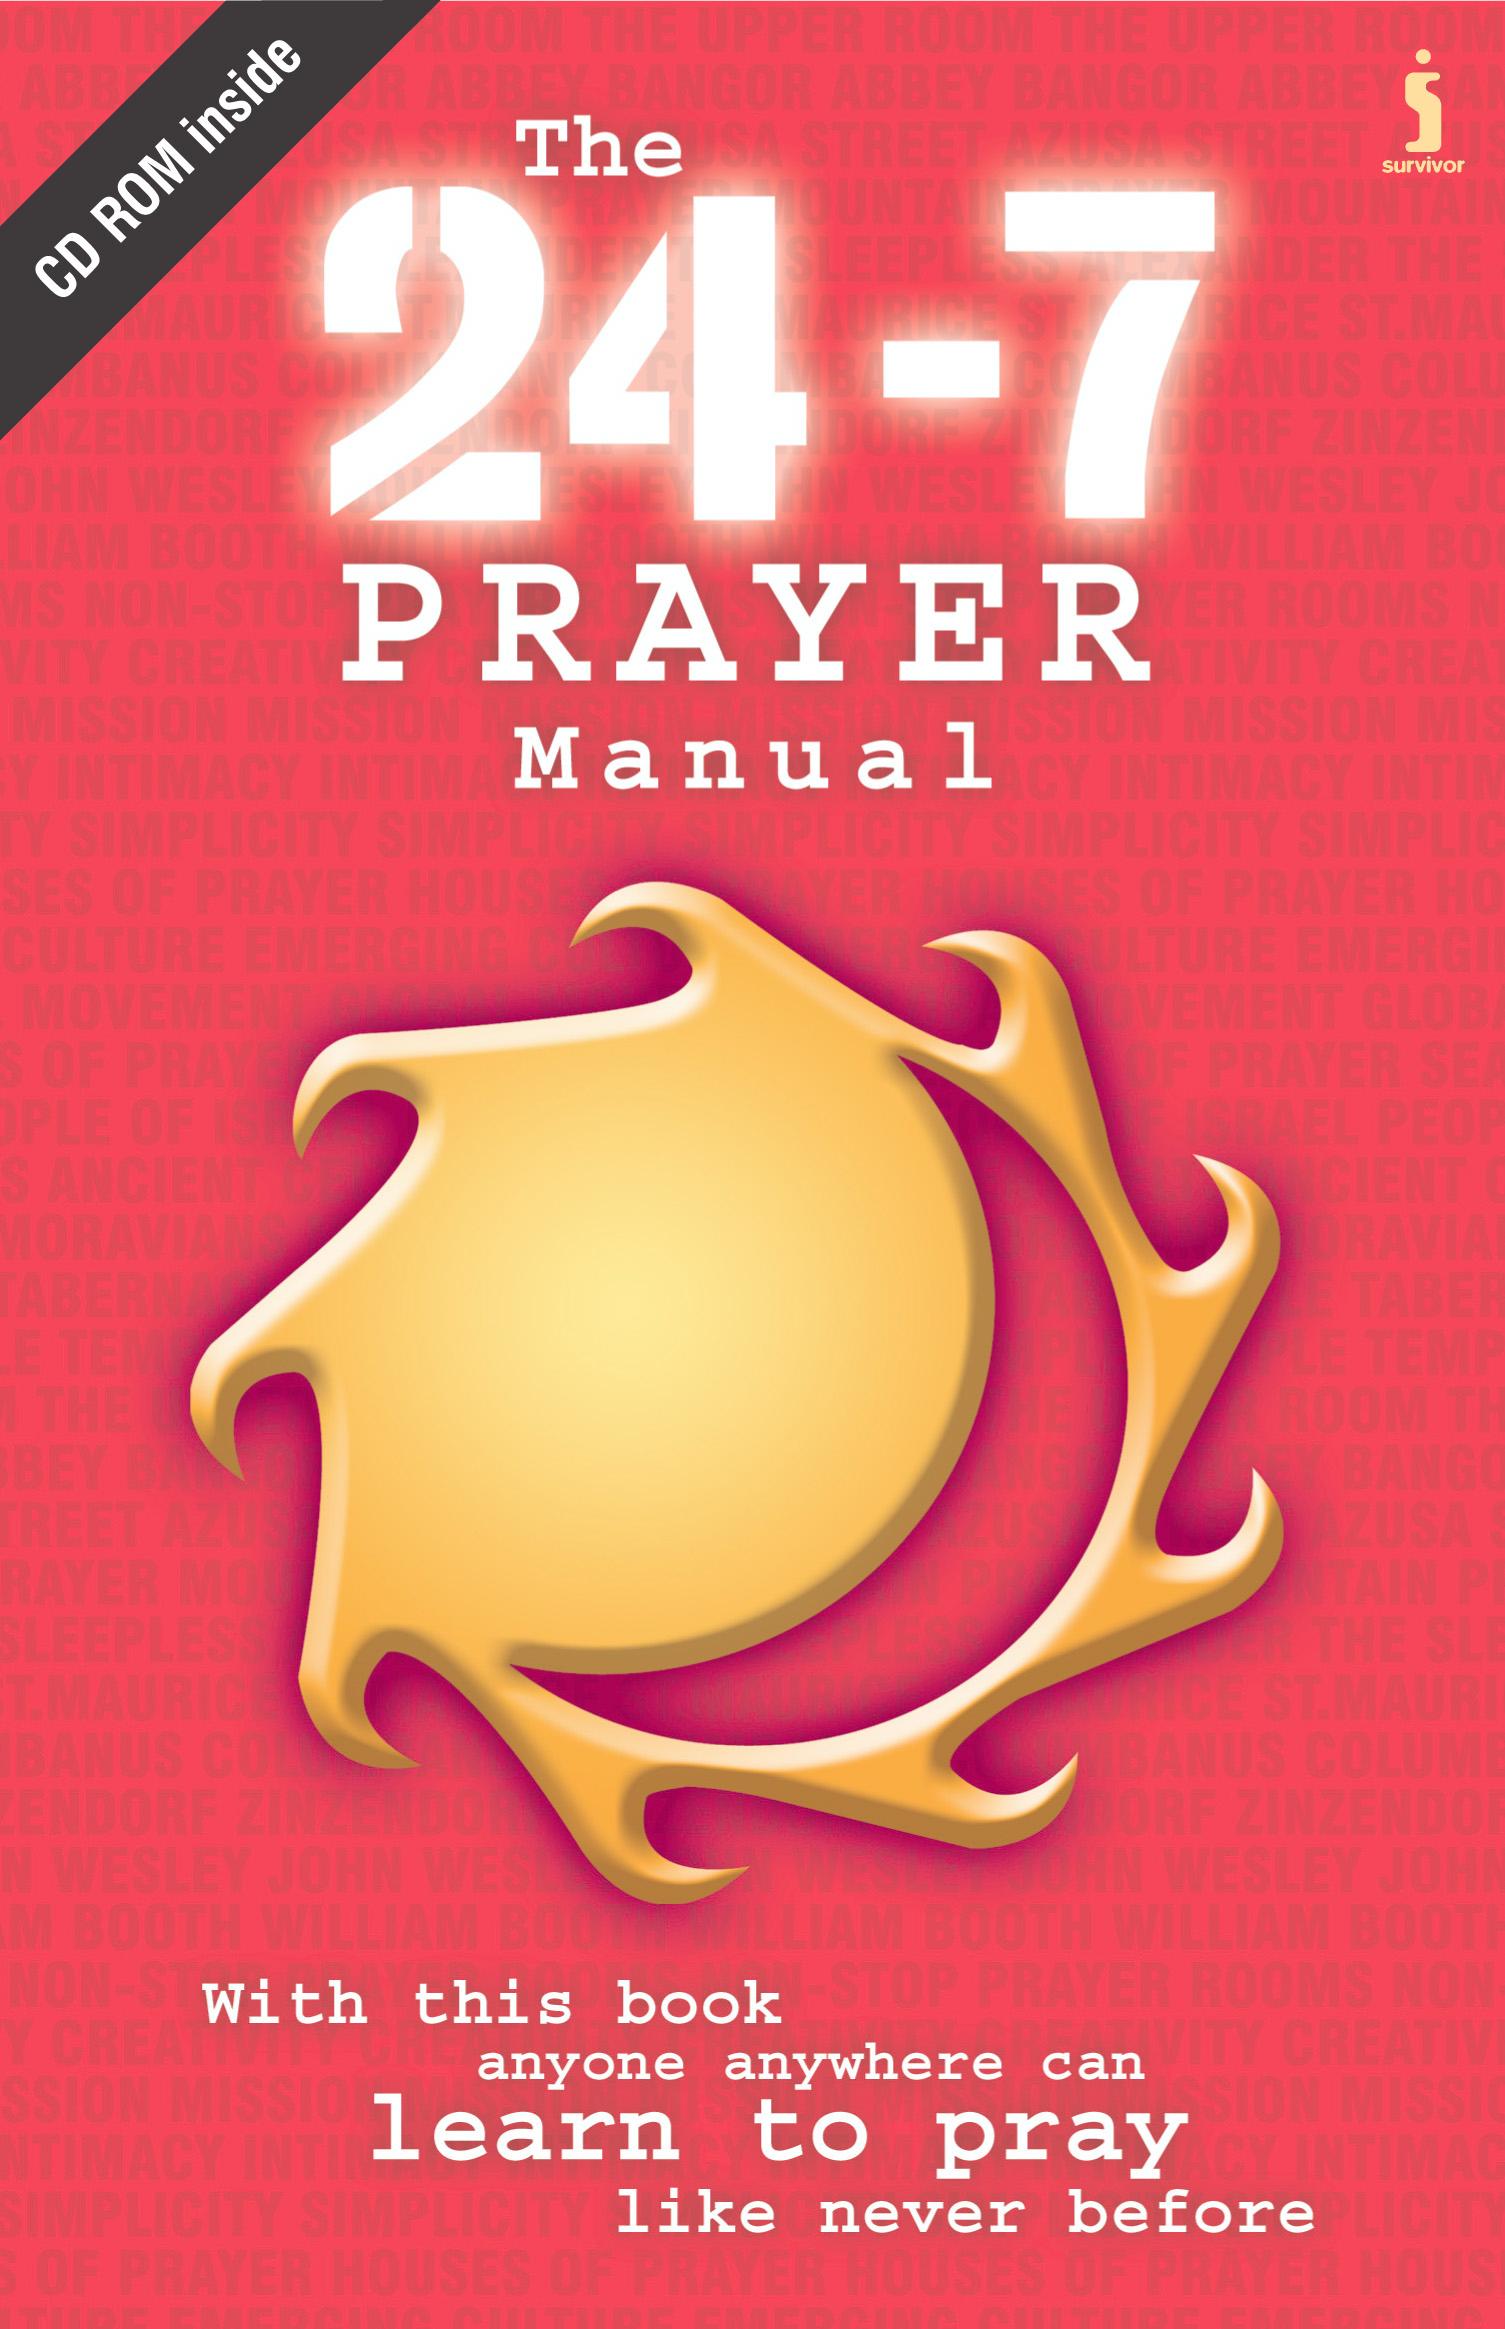 (2003) The 24-7 Prayer Manual